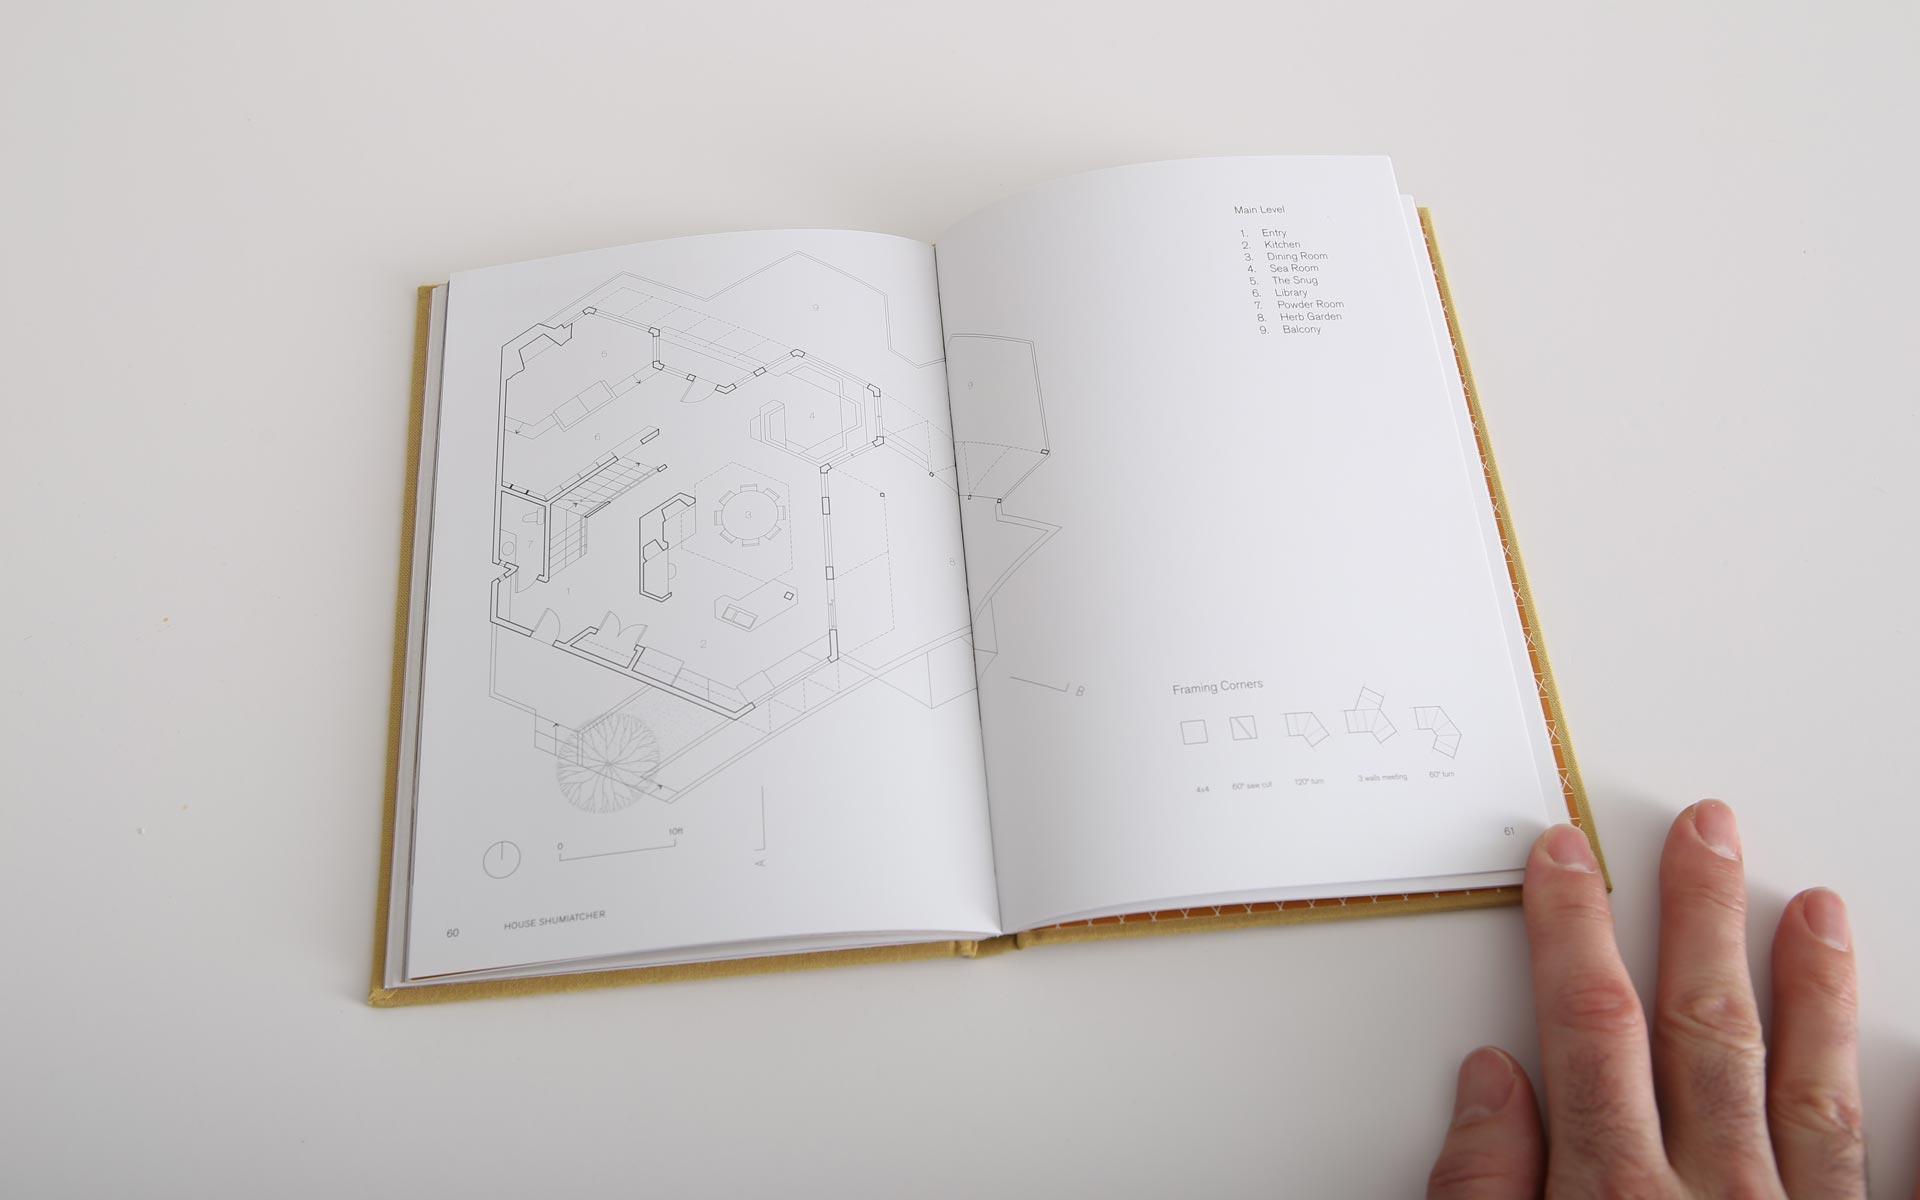 shumiatcher-ubc-sala-book-design-7